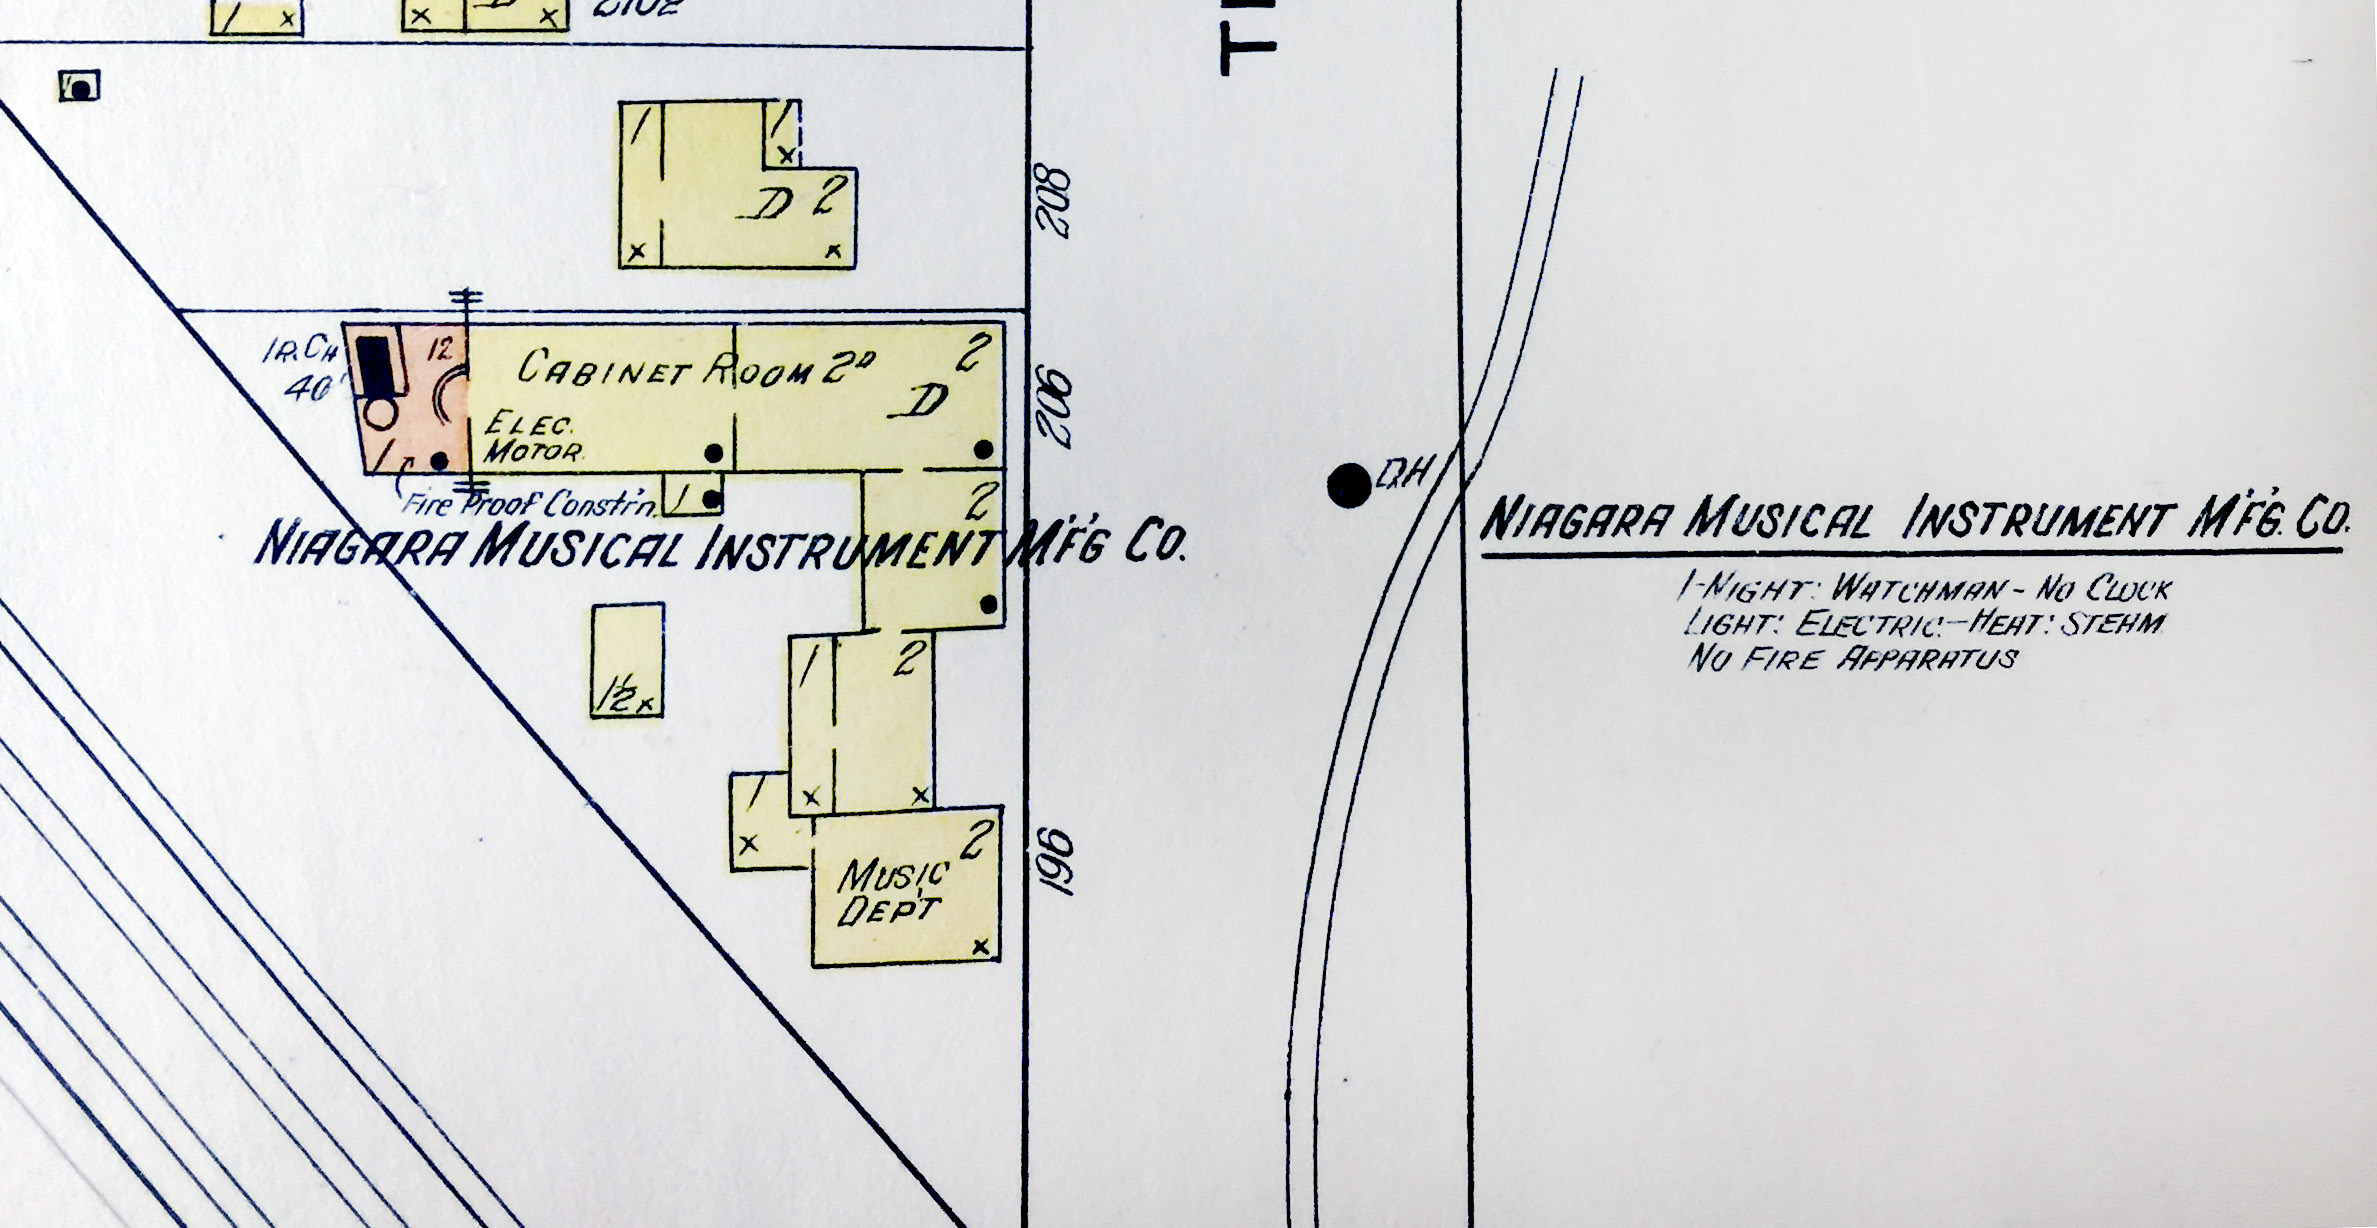 Niagara Musical Instrument Mfg Co. 2, map detail (Sanborn Map Company, 1910, 1913).jpg